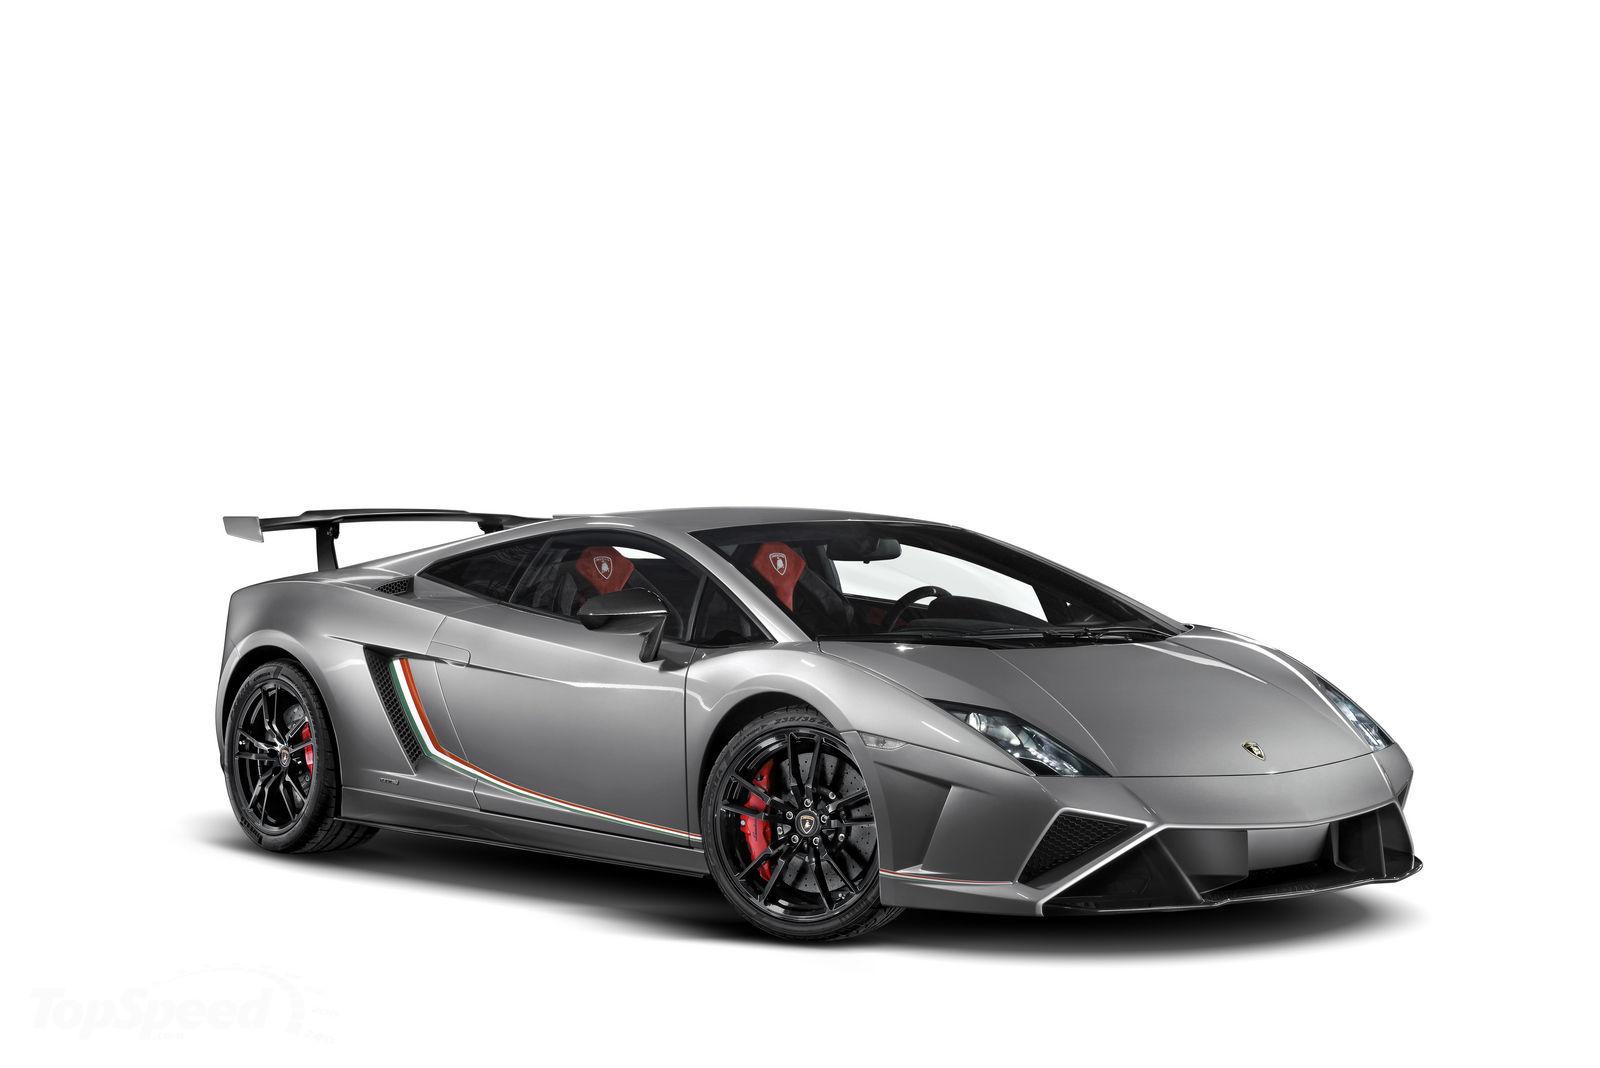 Wonderful 2014 Lamborghini Gallardo LP 570 4 Squadra Corse 8